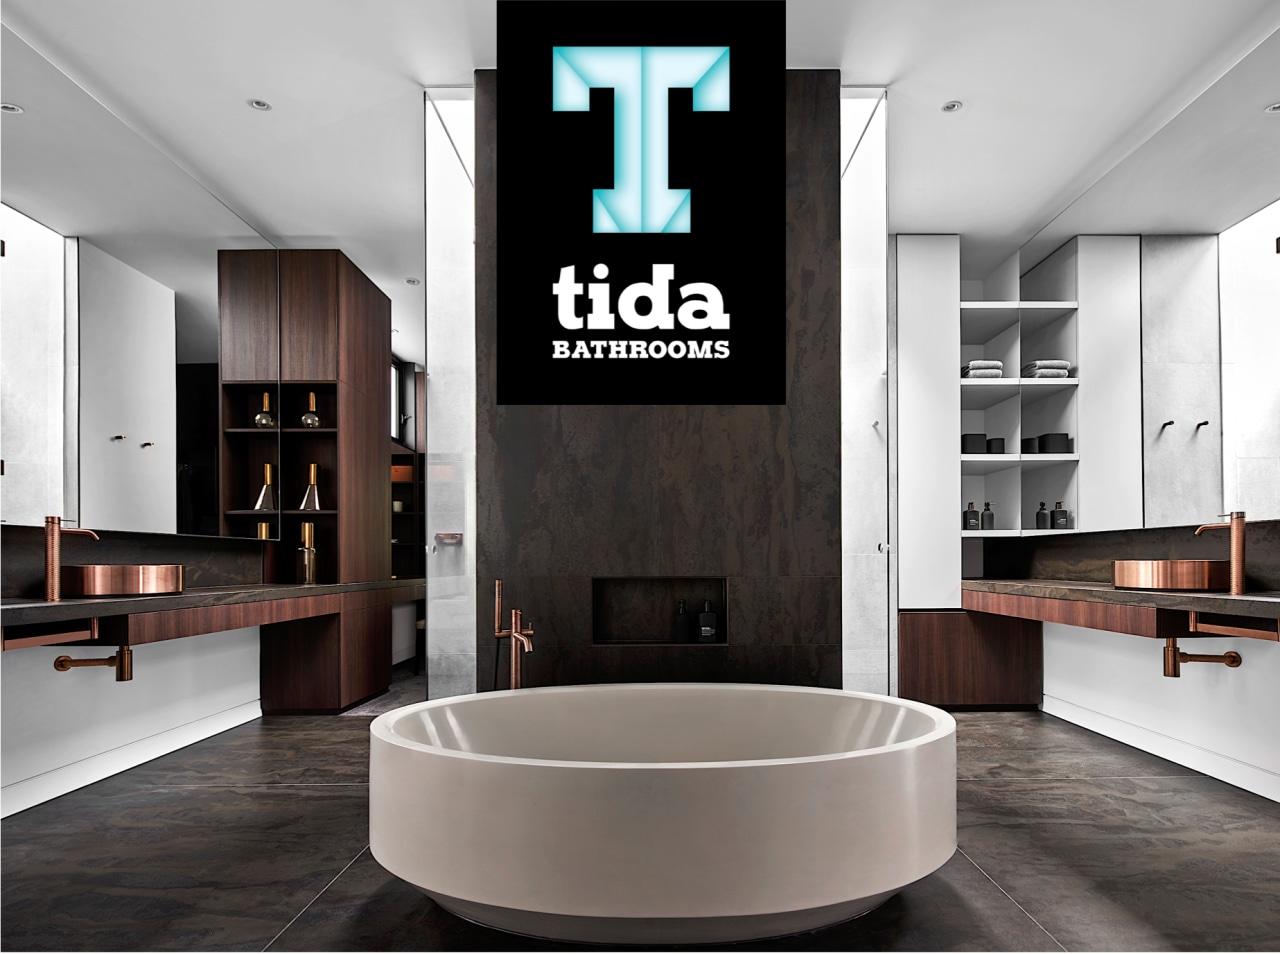 2021 TIDA AU Bathrooms entry Terms graphic -